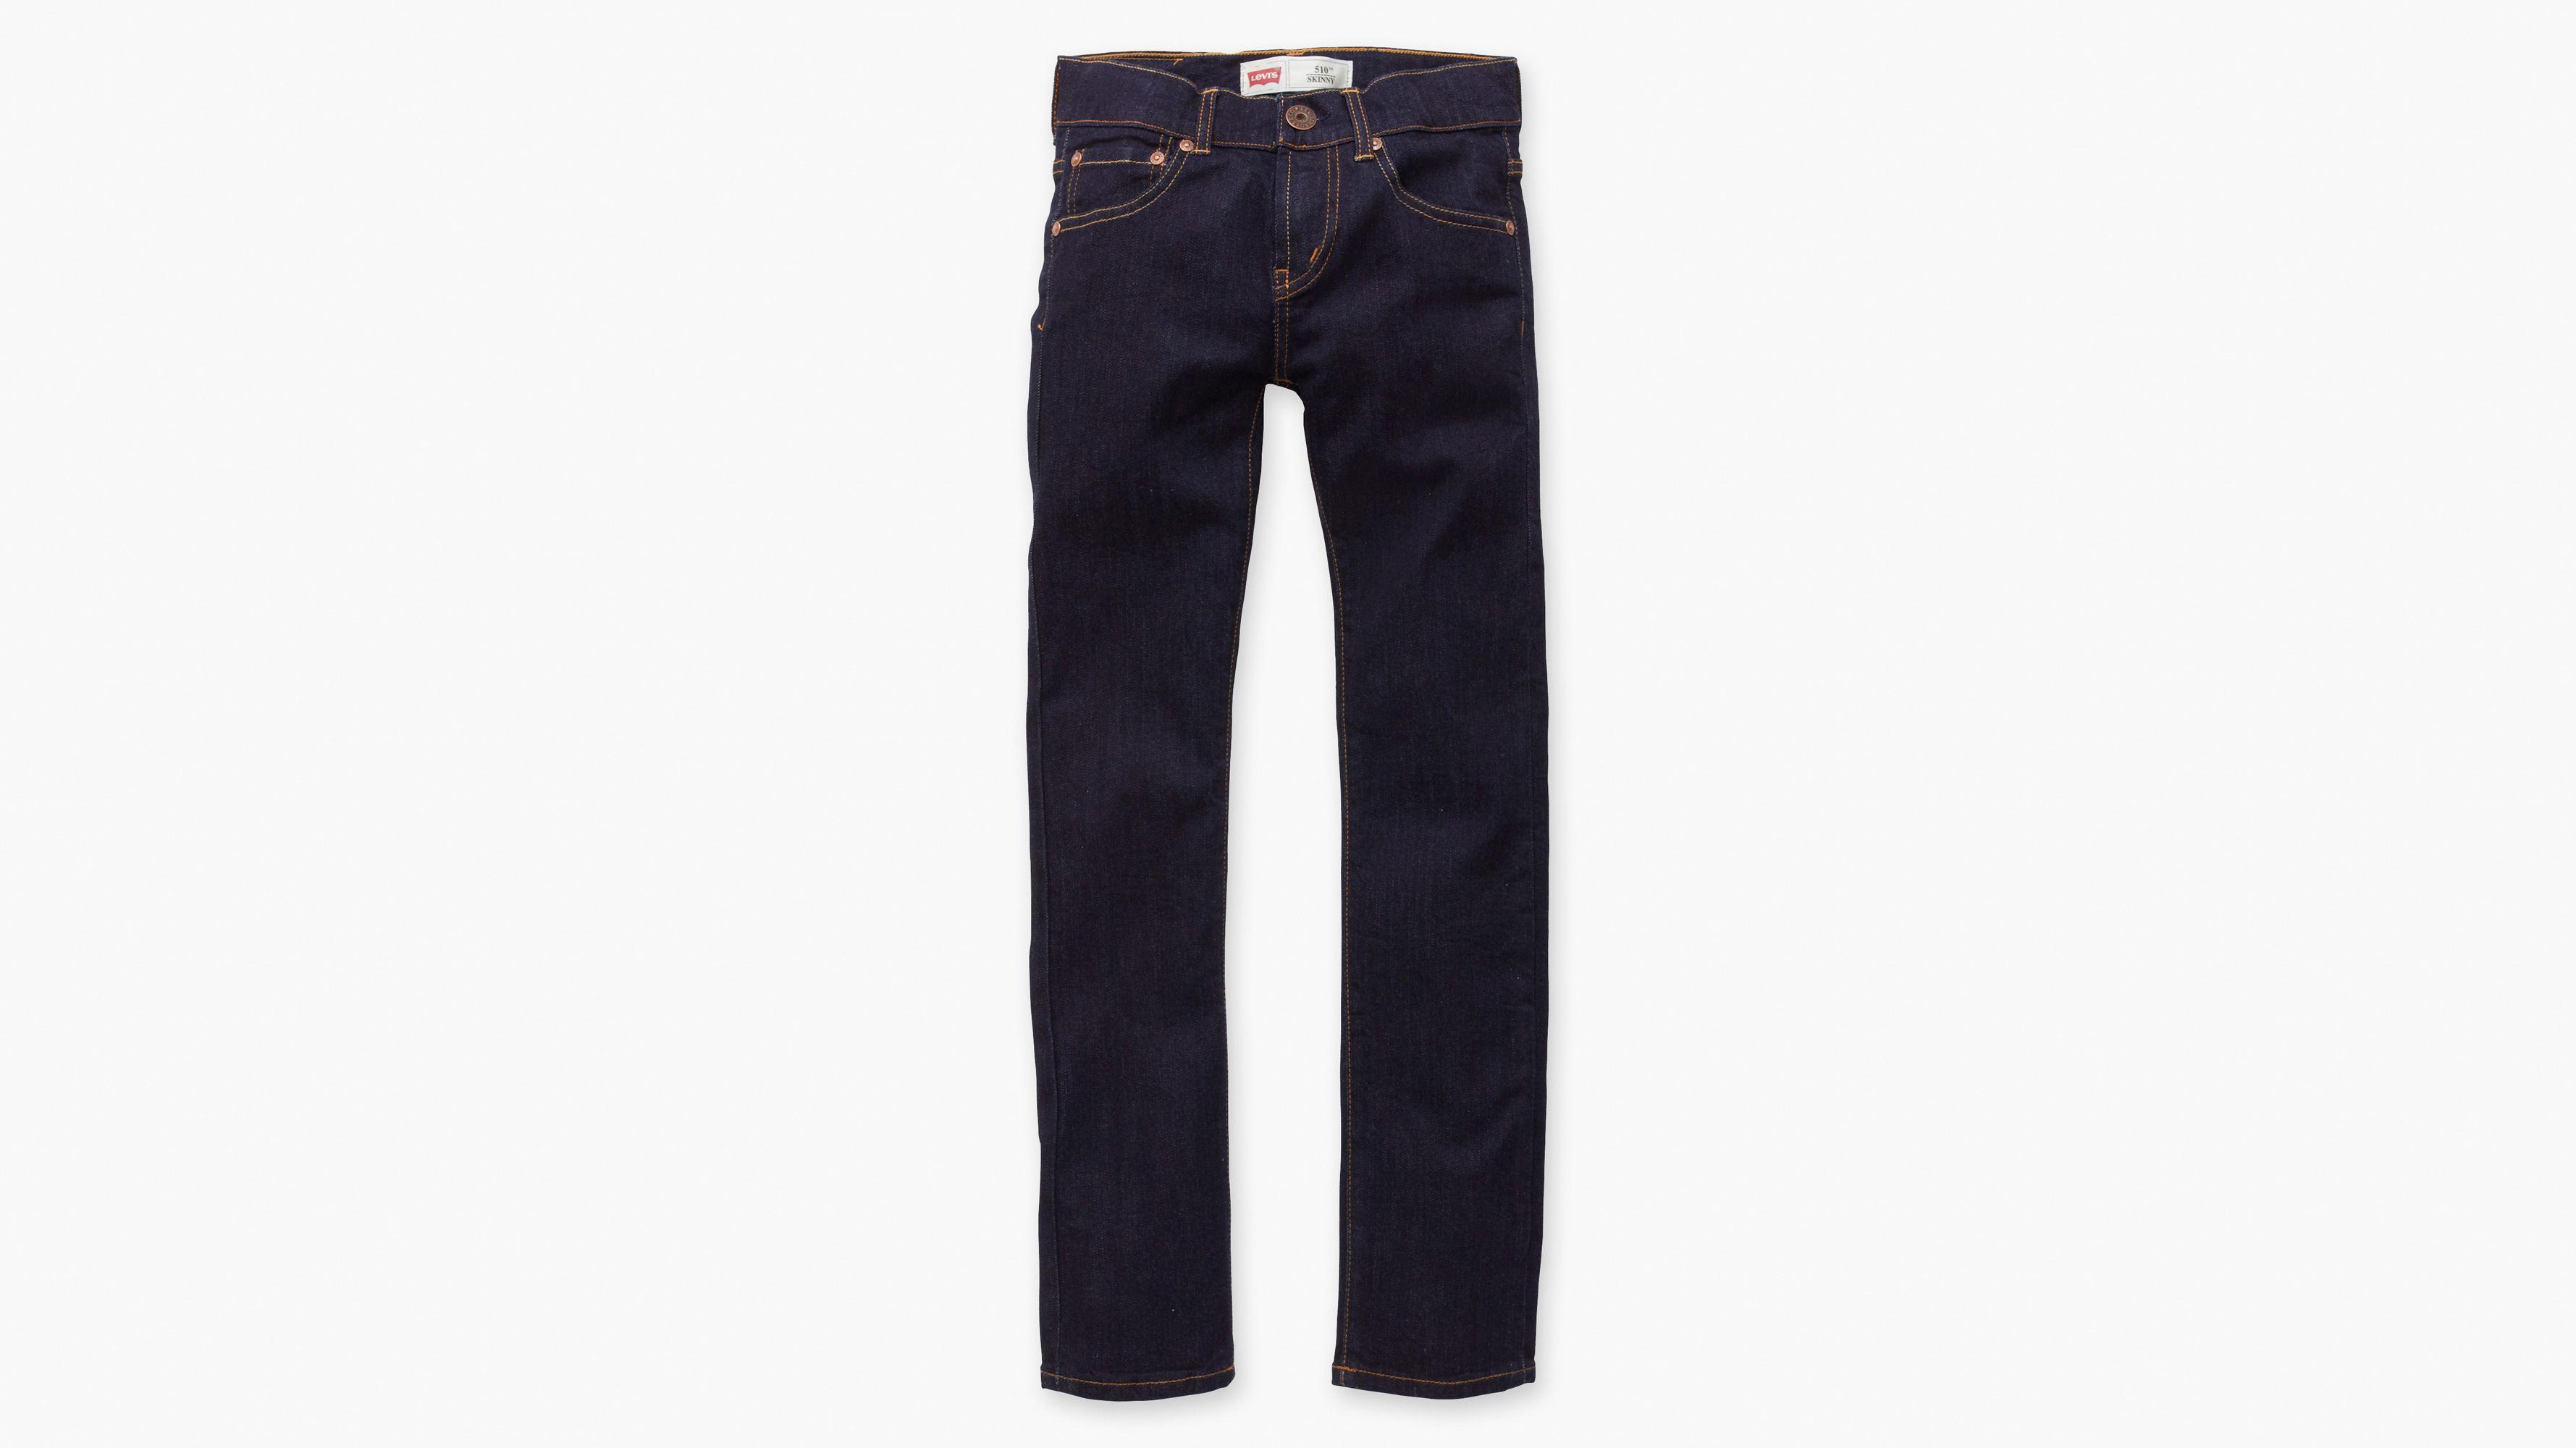 Bébé, Puériculture Original 12 Mois Pantalon Souple Imitation Jean